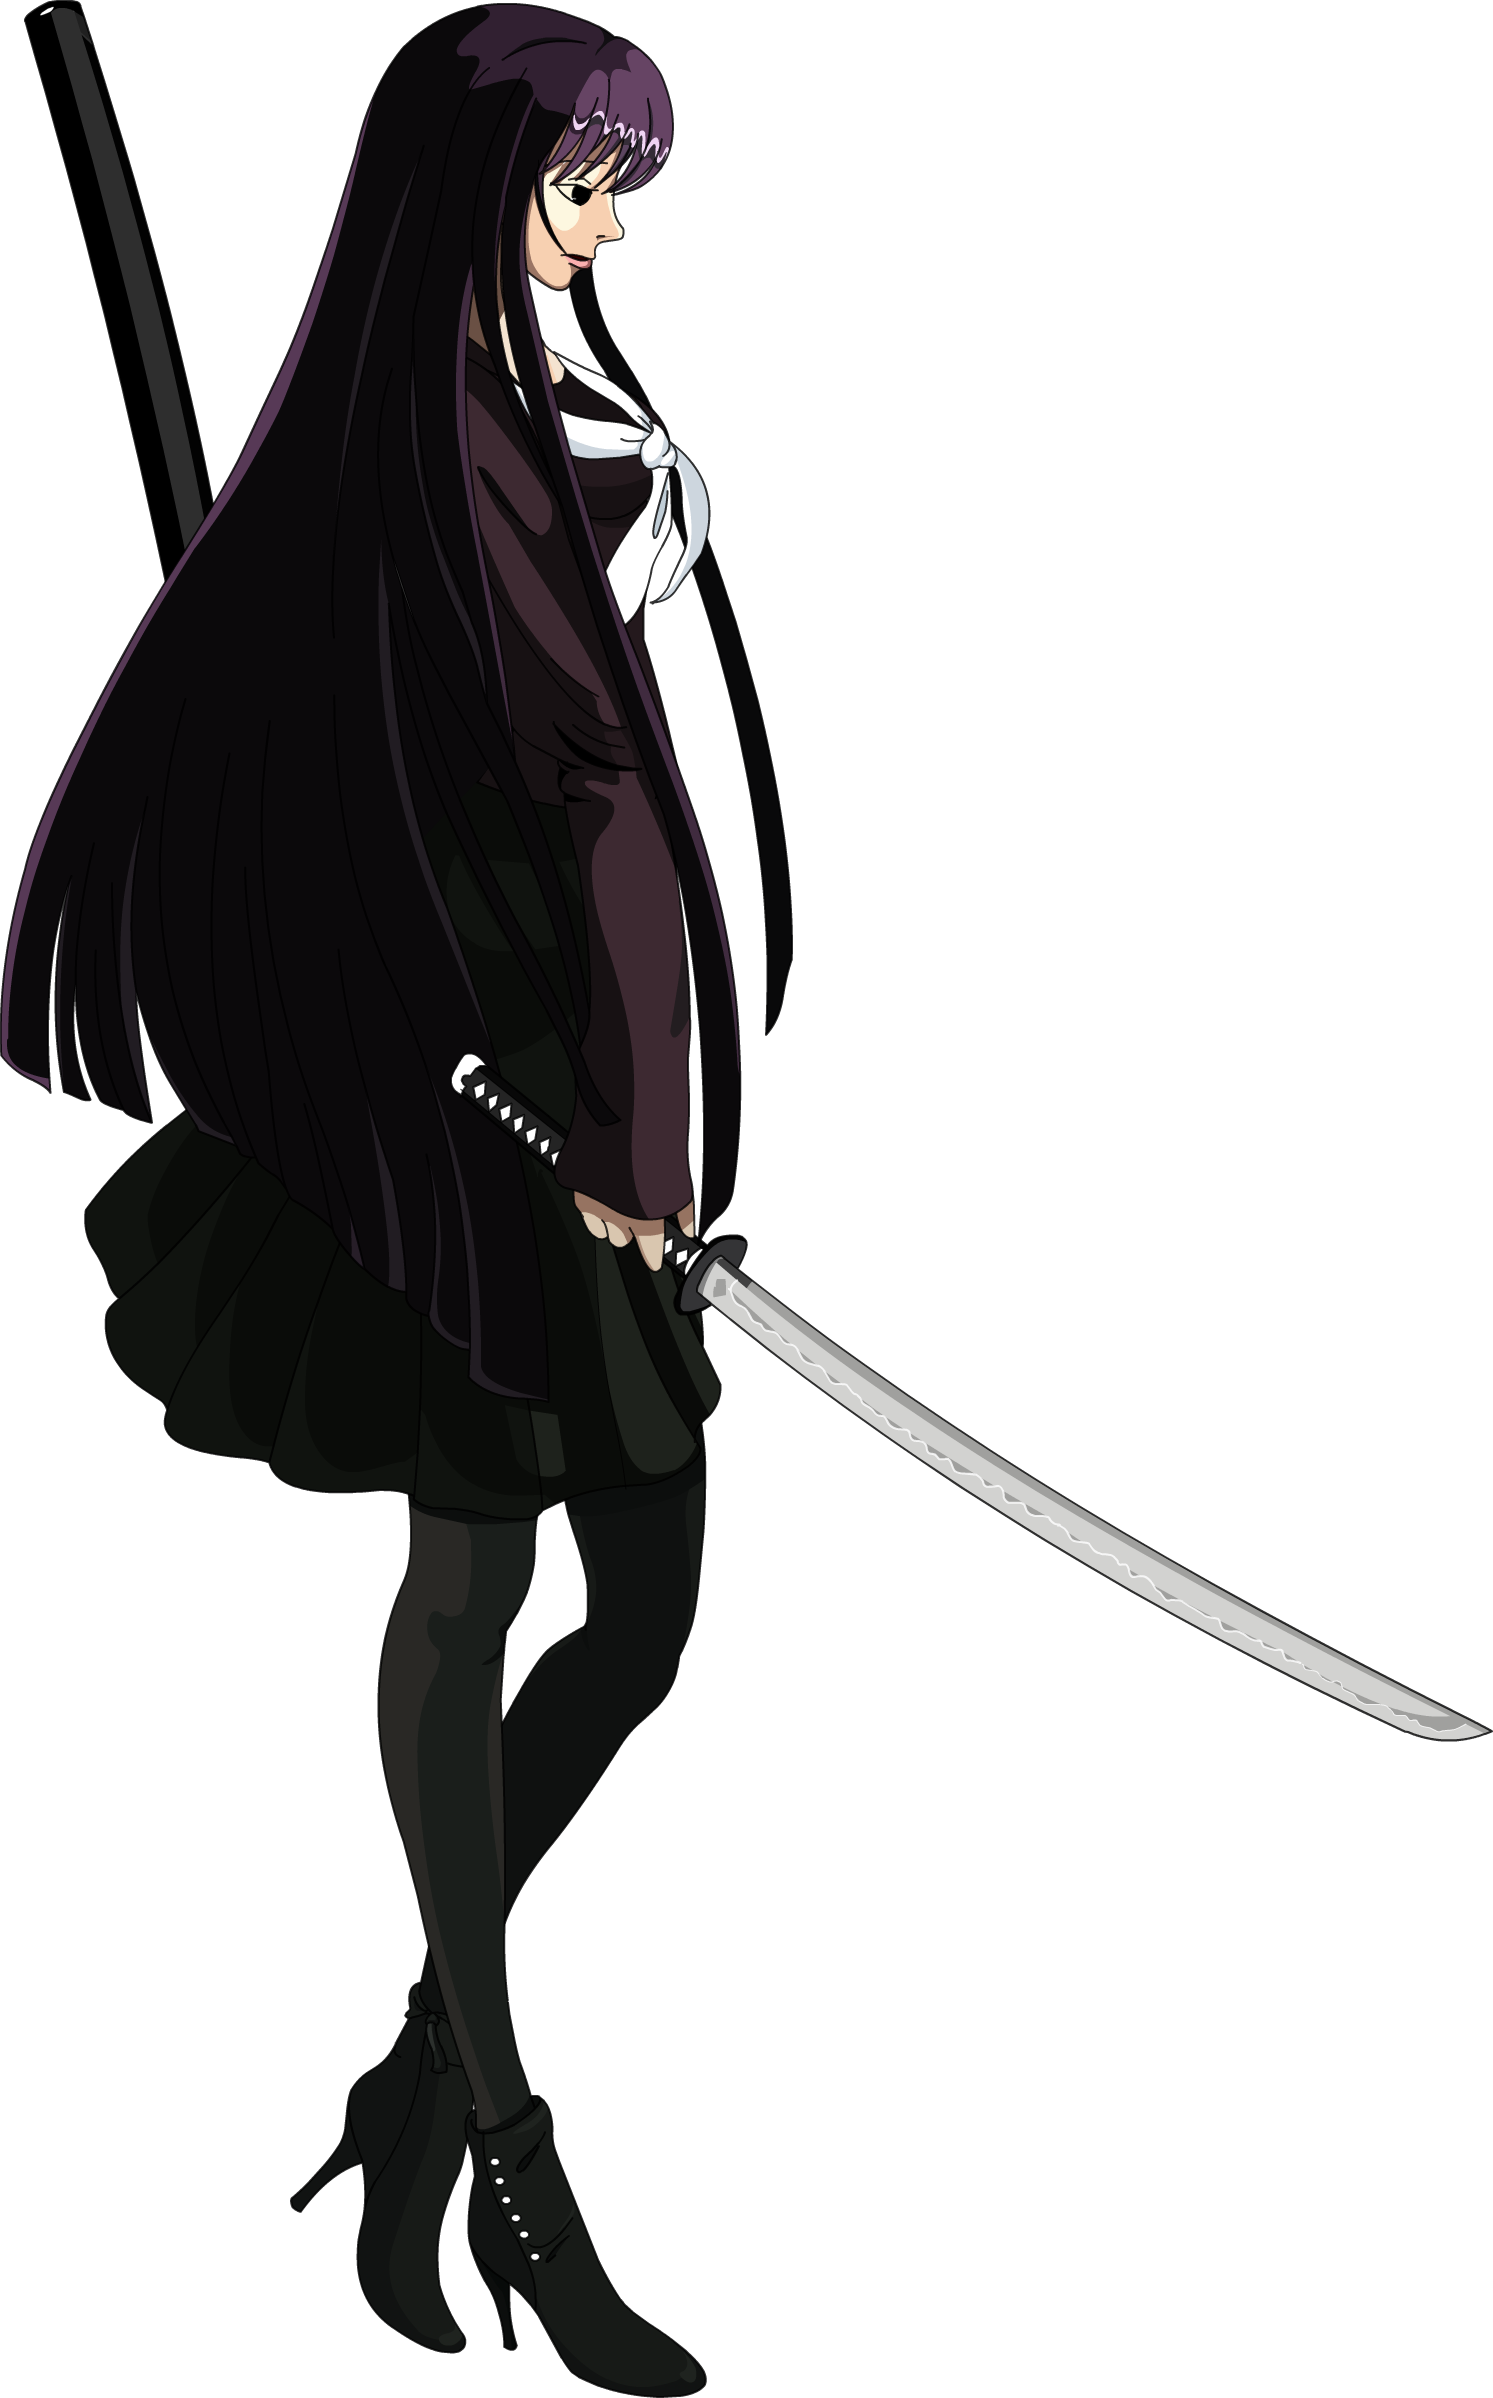 School Girl Silhouette